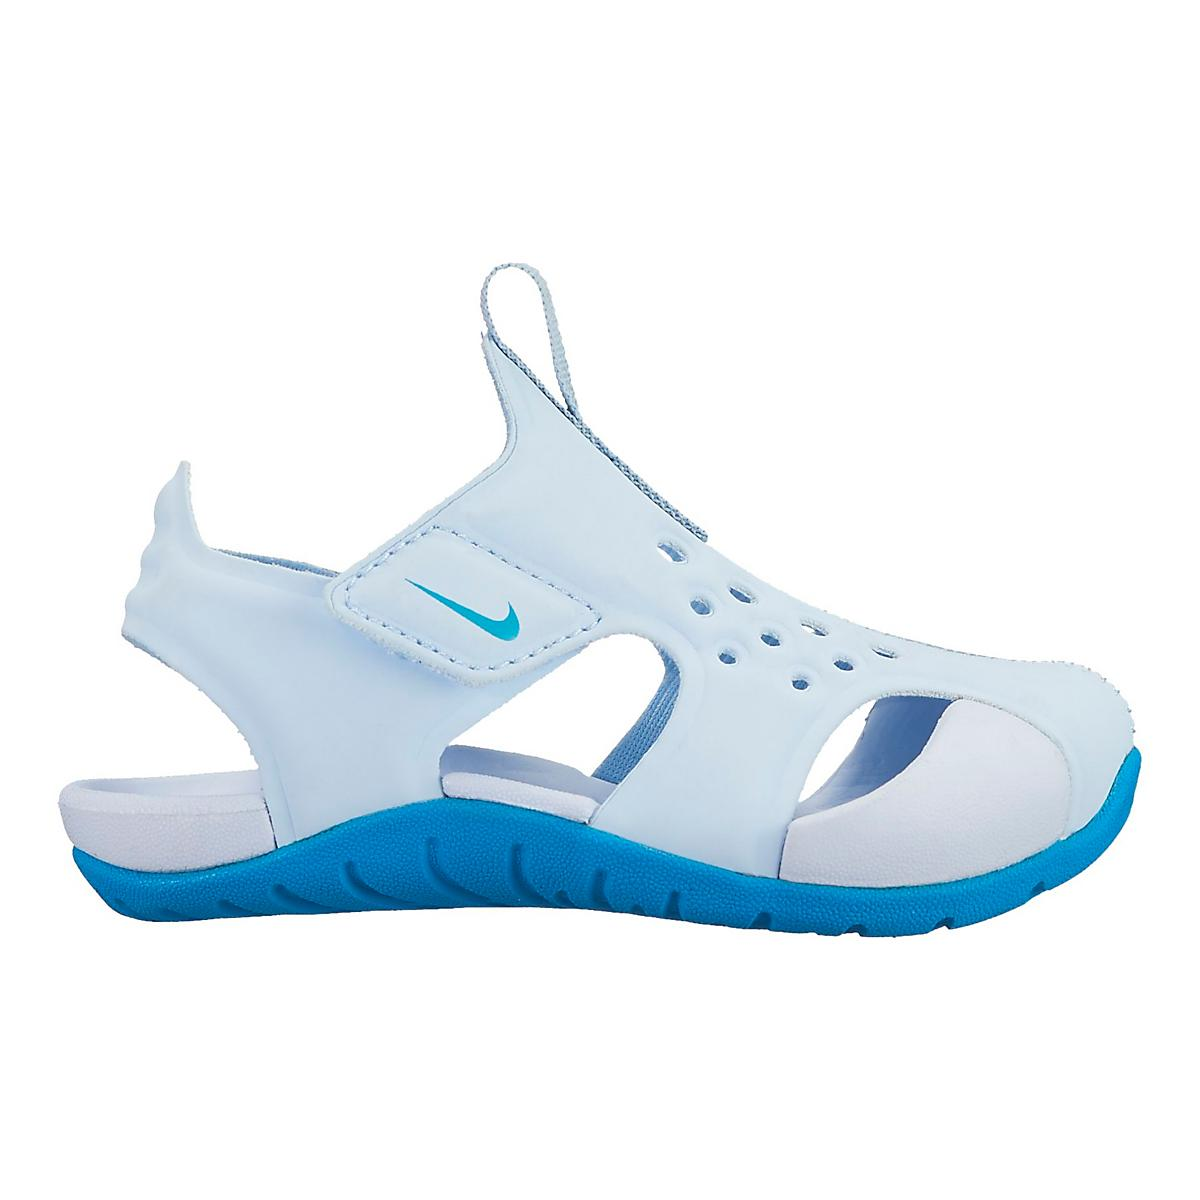 Protect Sunray Sunray Nike Kids 2 Kids Protect Nike 2 Nike Kids cjq3RL5A4